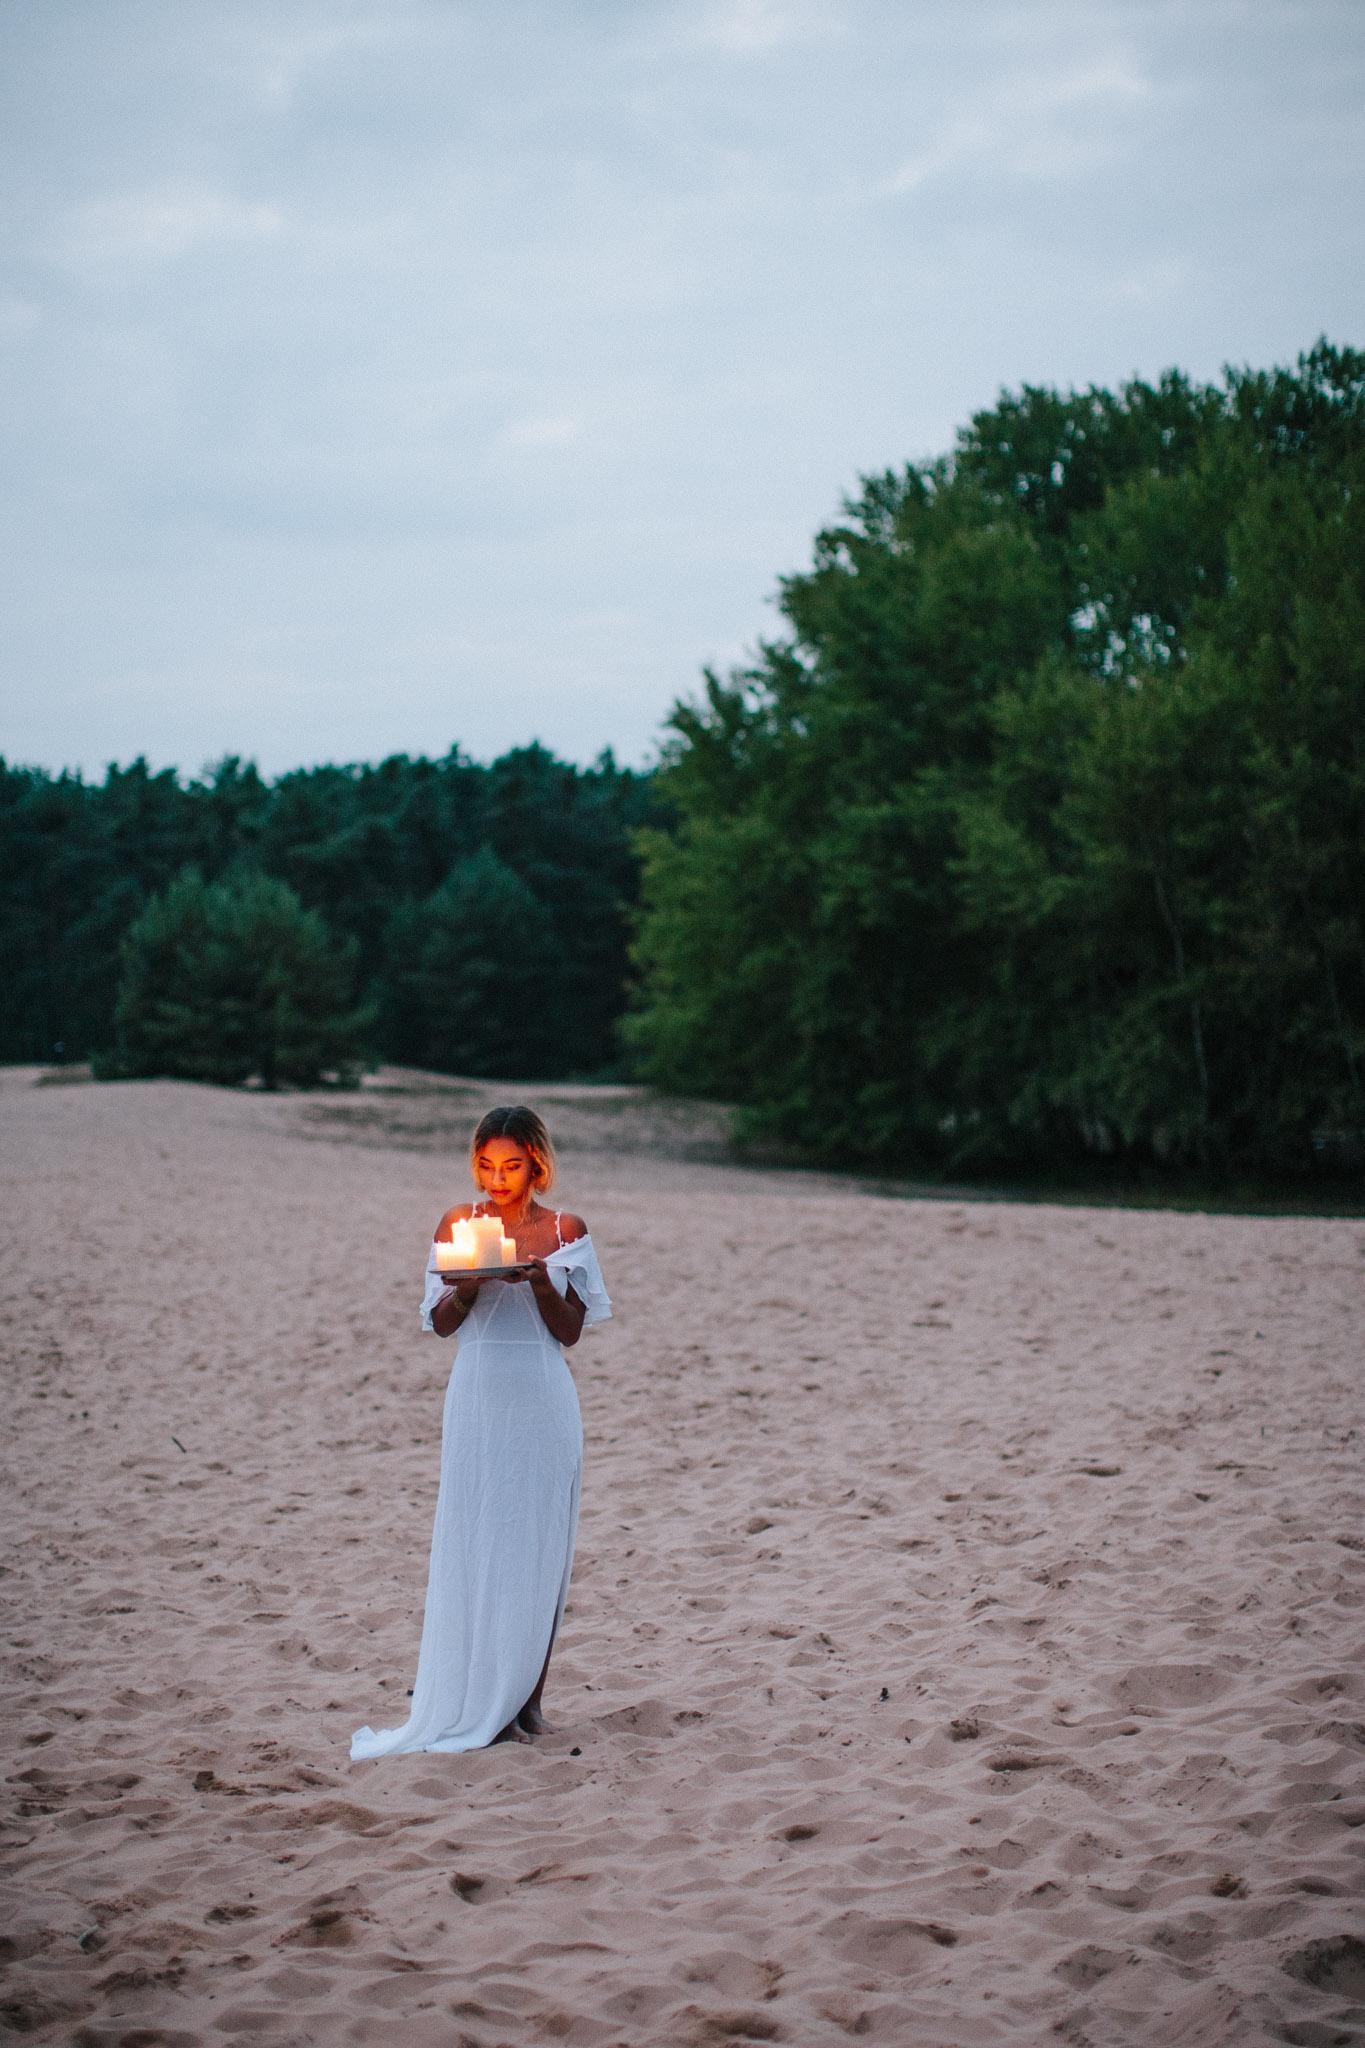 Speyer-Moroccan-Wedding-Inspiration-Pia-Anna-Christian-Wedding-Photography-S-83.jpg